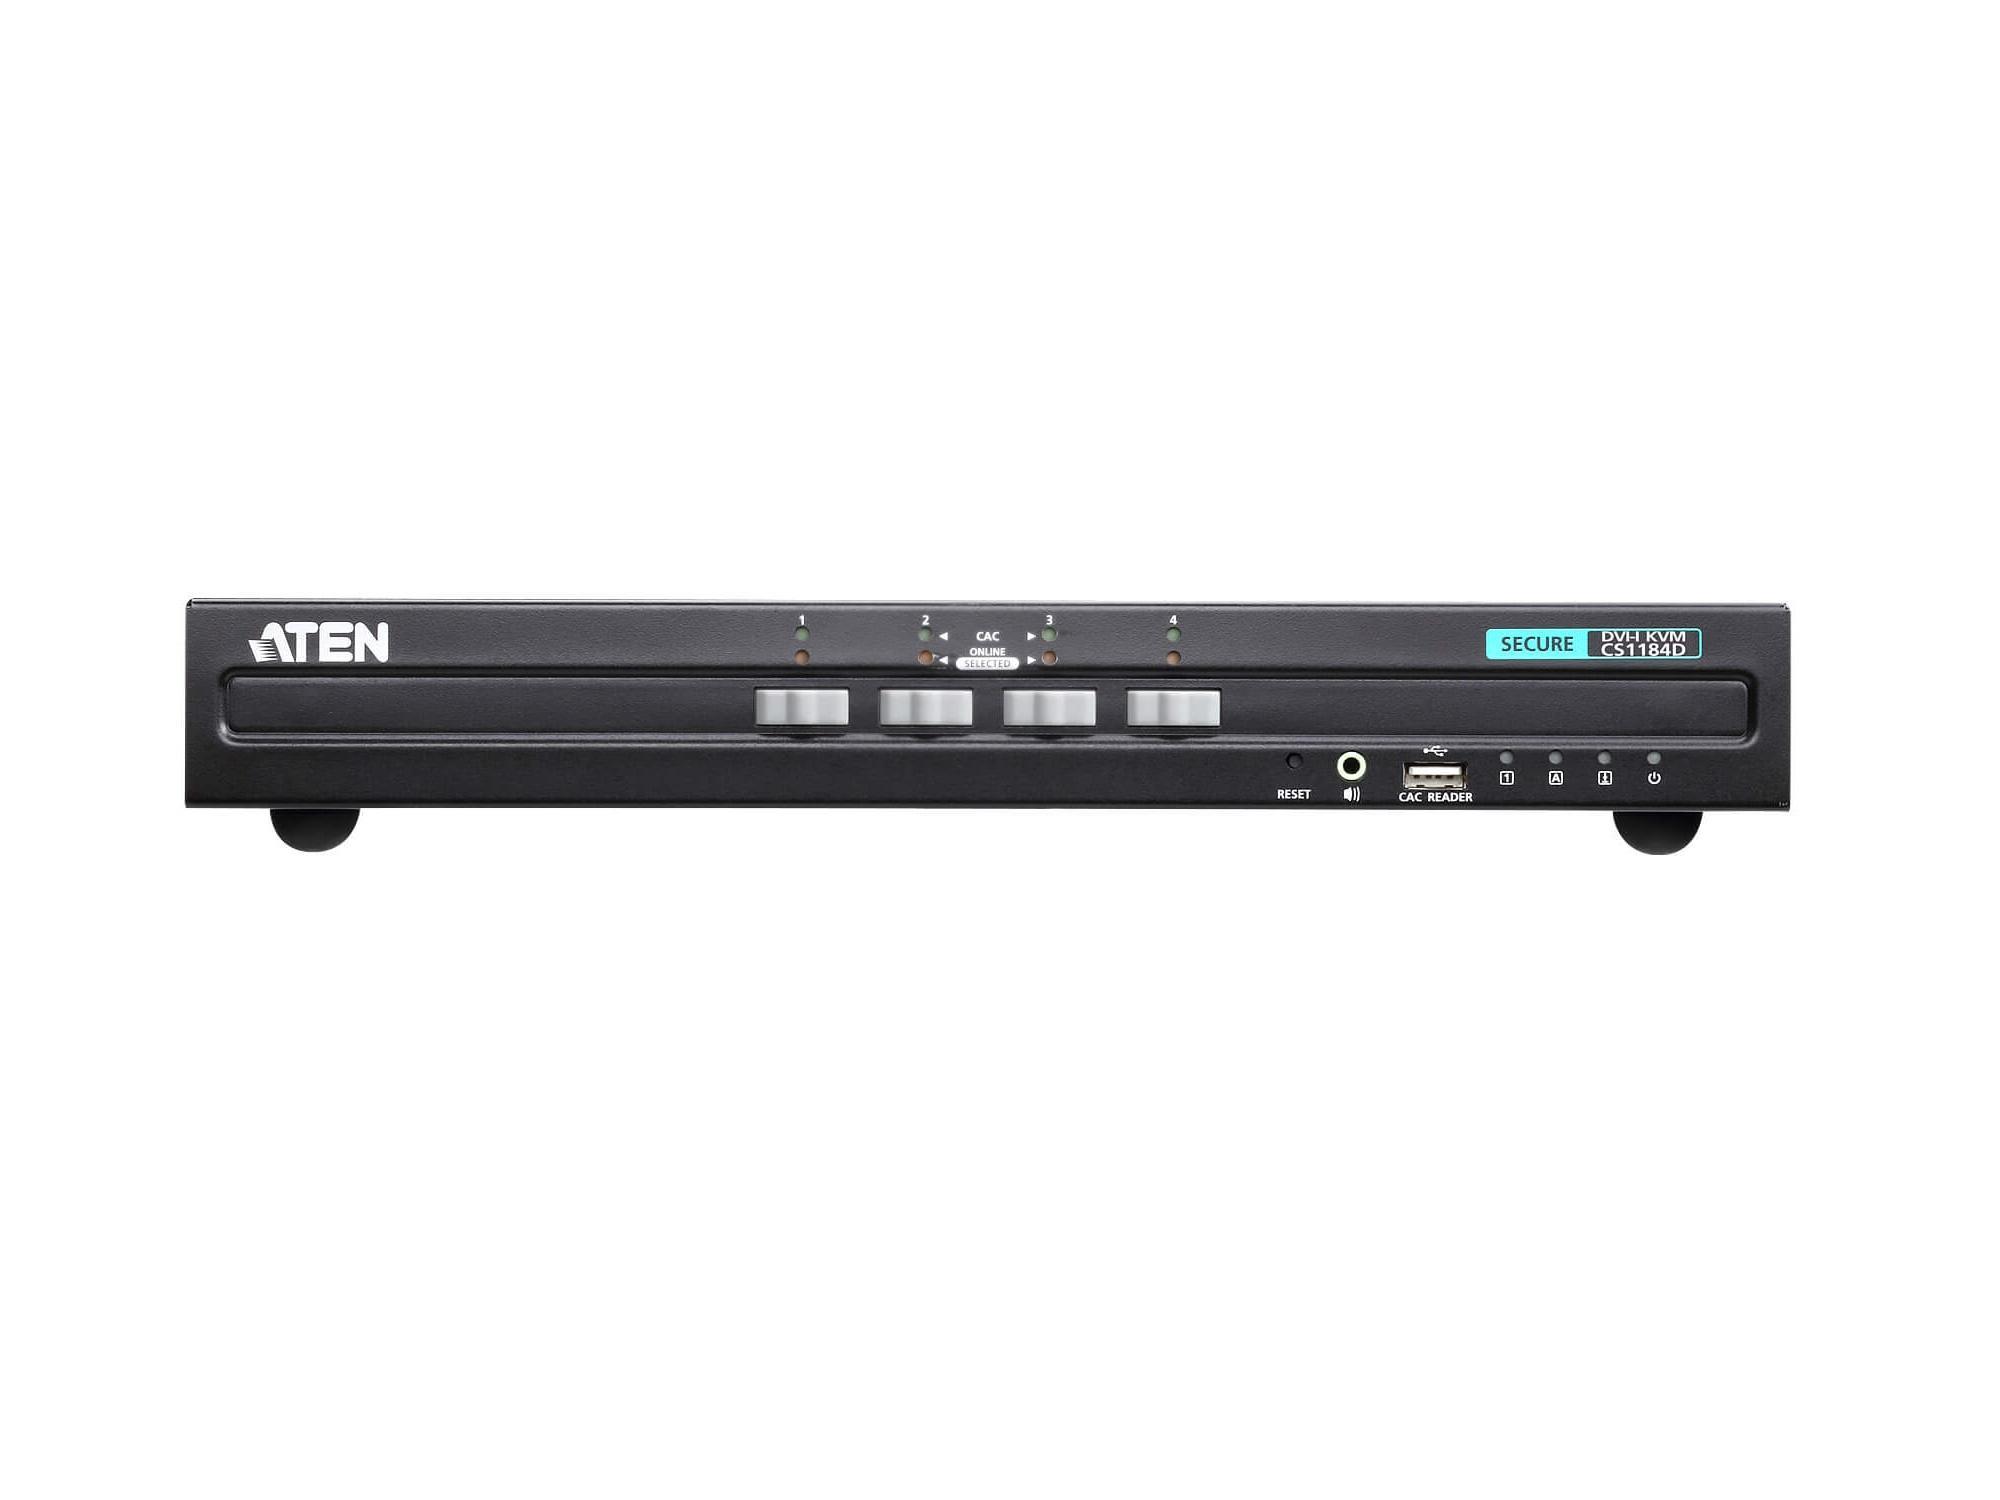 Aten CS1184D 4-Port USB DVI Secure KVM Switch (PSS PP v3.0 Compliant)